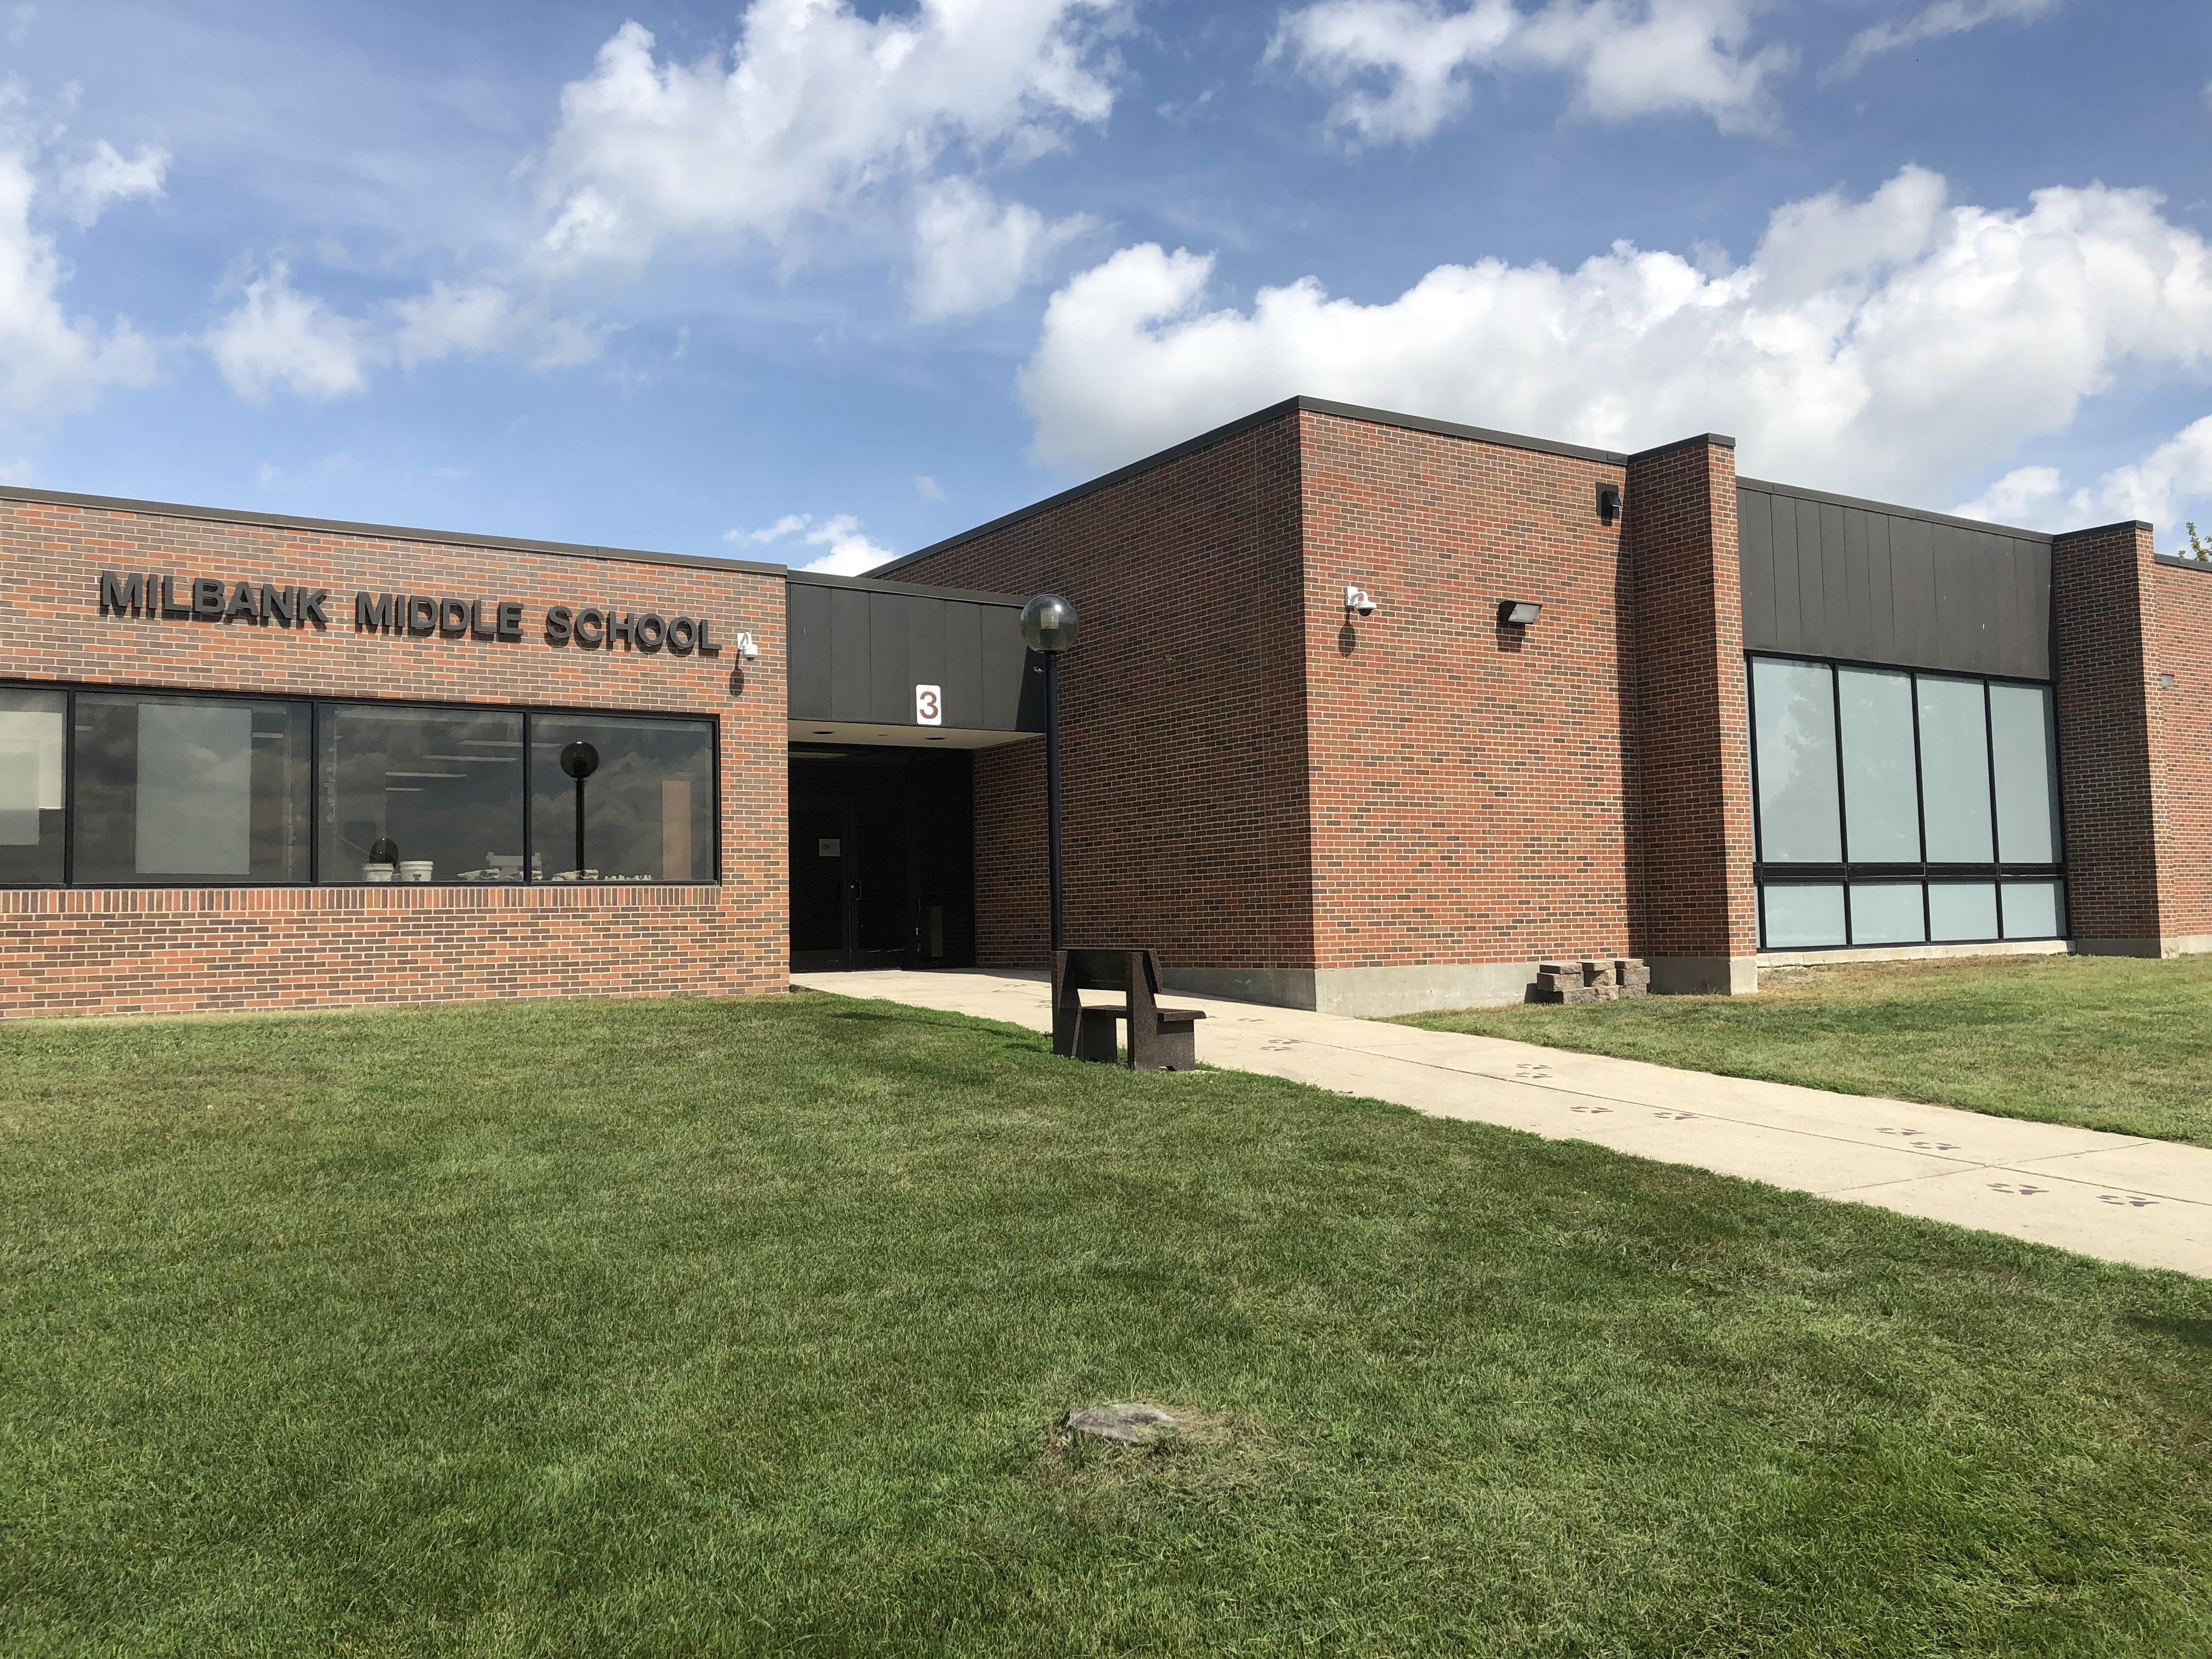 Milbank Middle School